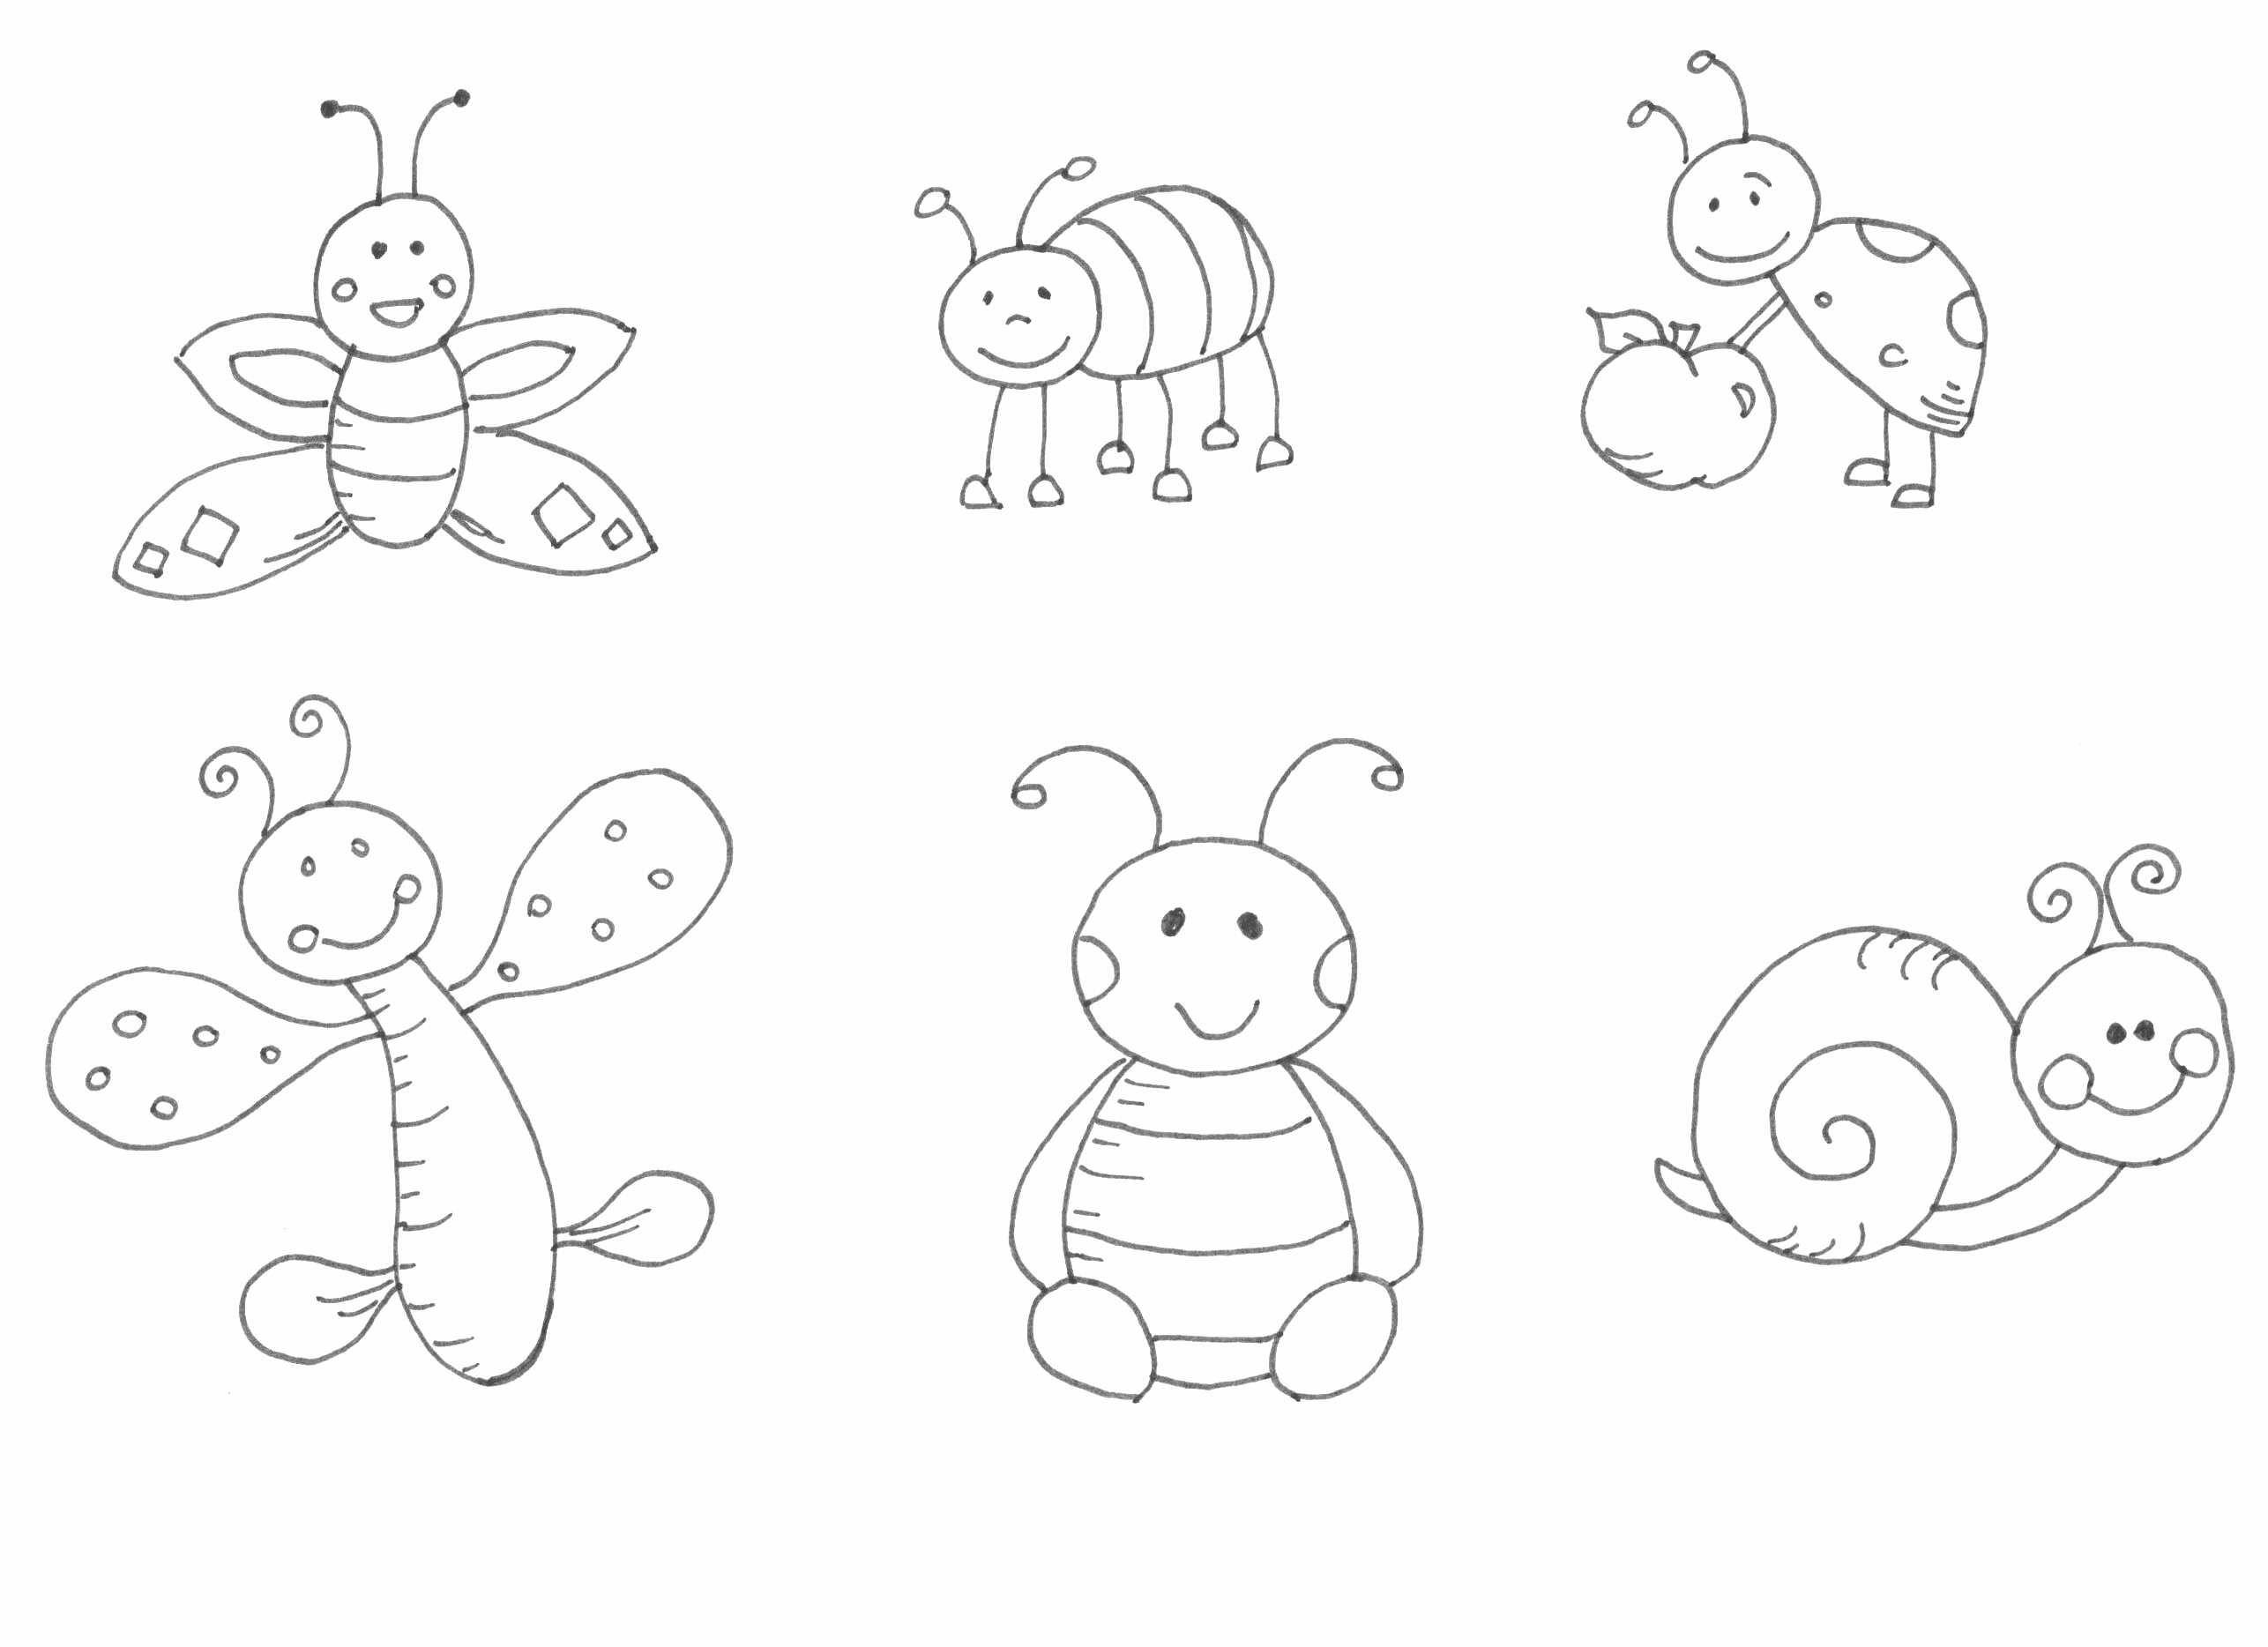 bogarak rajz, drawing bugs, coloring page, színező